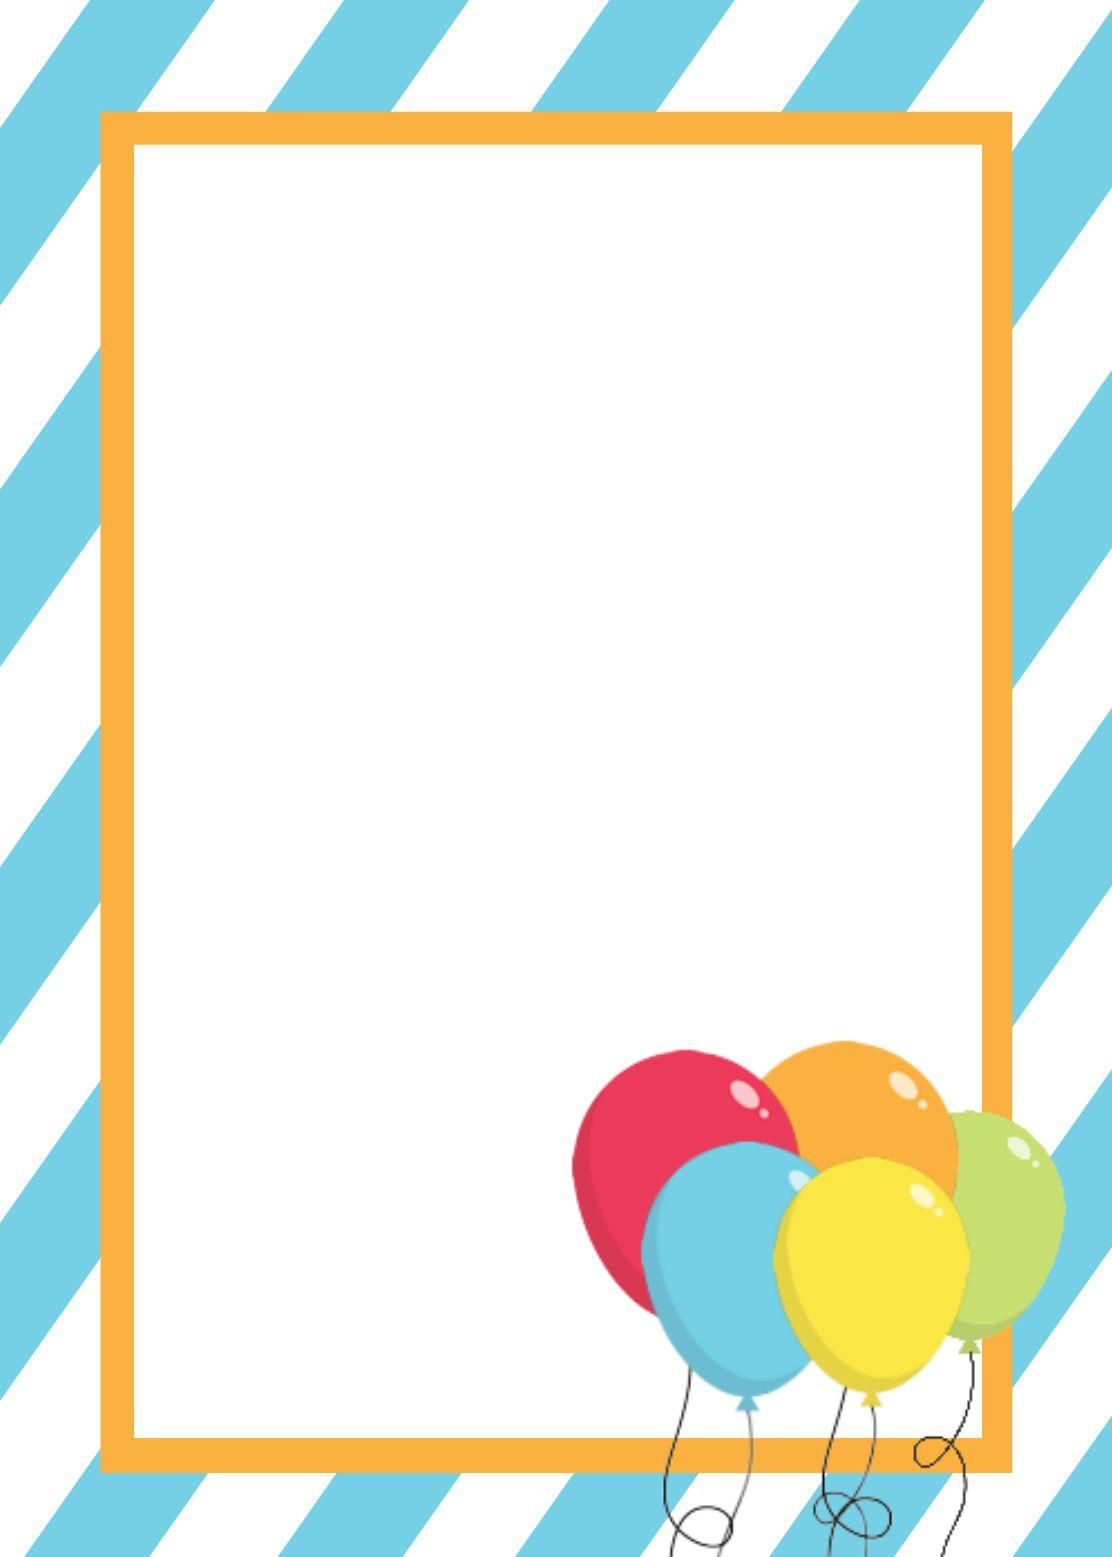 012 Dreaded Party Invite Template Word Idea  Holiday Invitation Wording Sample Retirement Free EditableFull